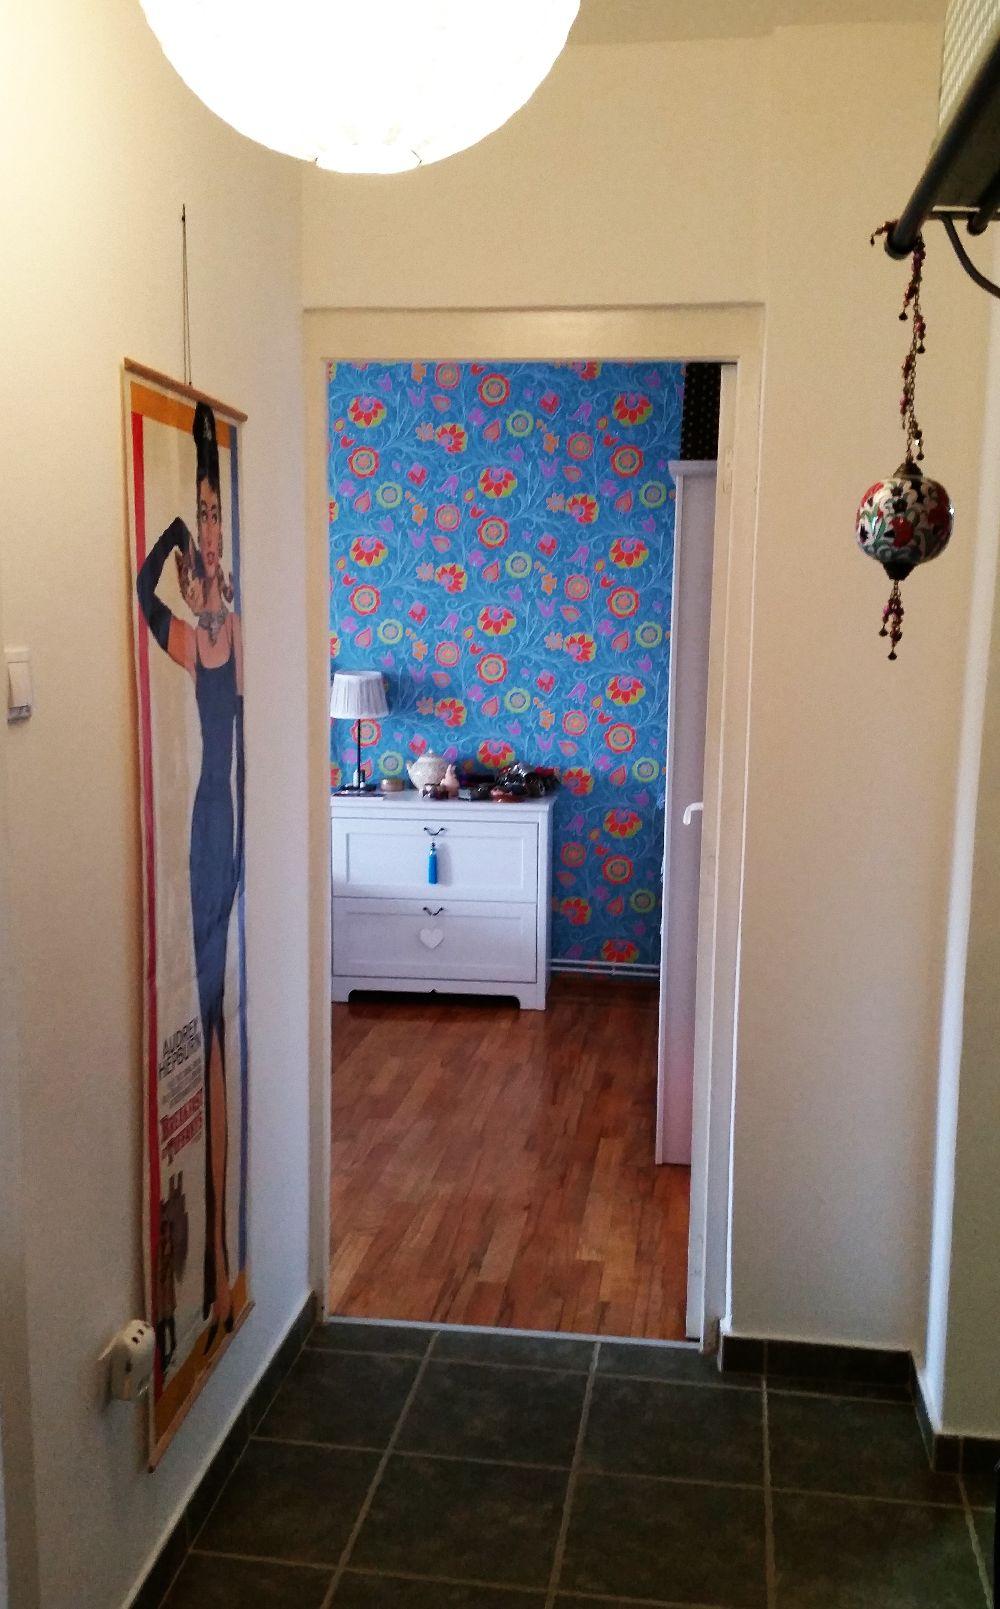 adelaparvu.com despre apartament 3 camere colorat in Sibiu, Foto Adela Parvu (23)